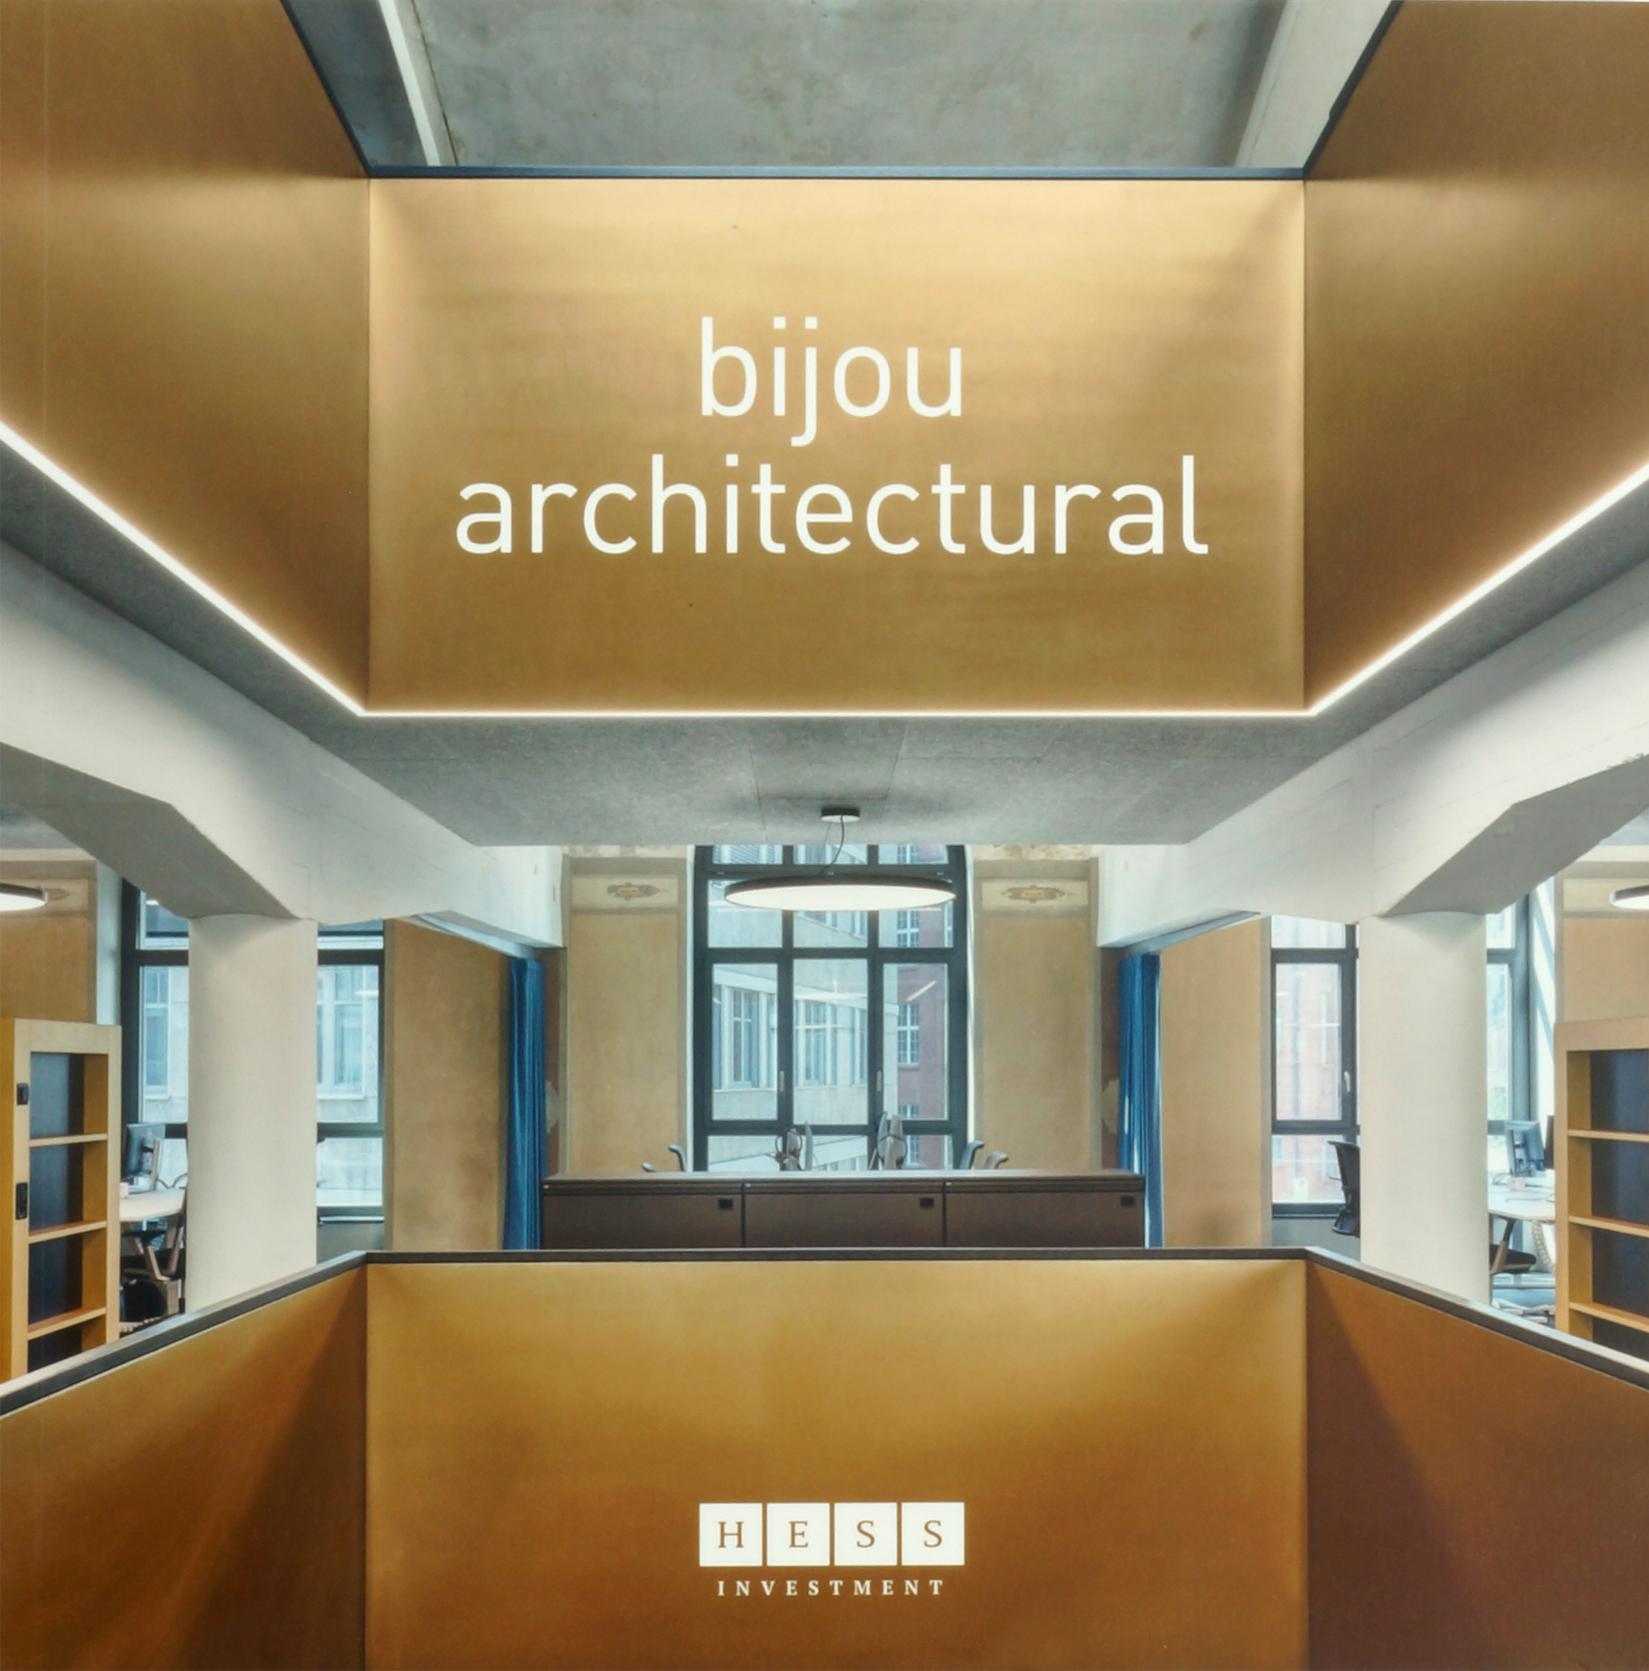 bijou architectural